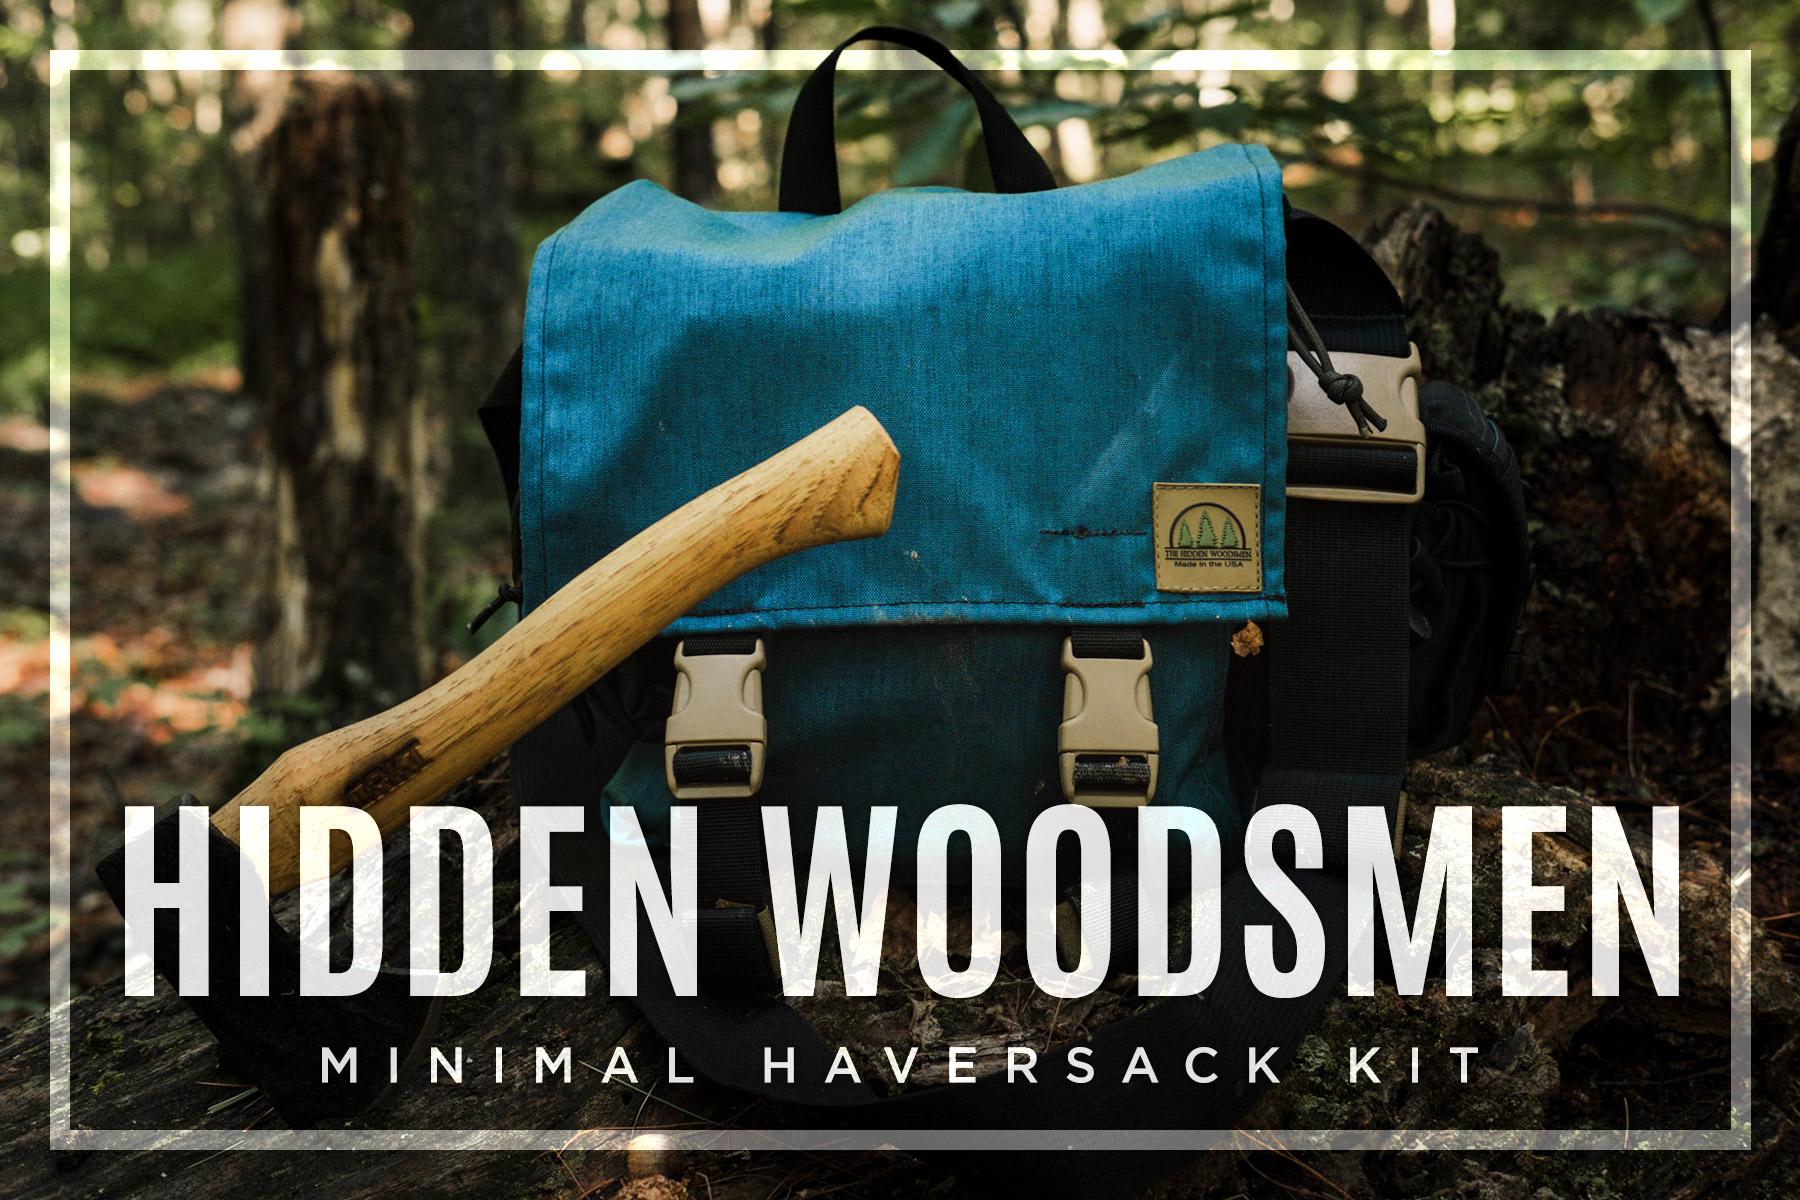 pathfinder handy haversack vs bag of holding